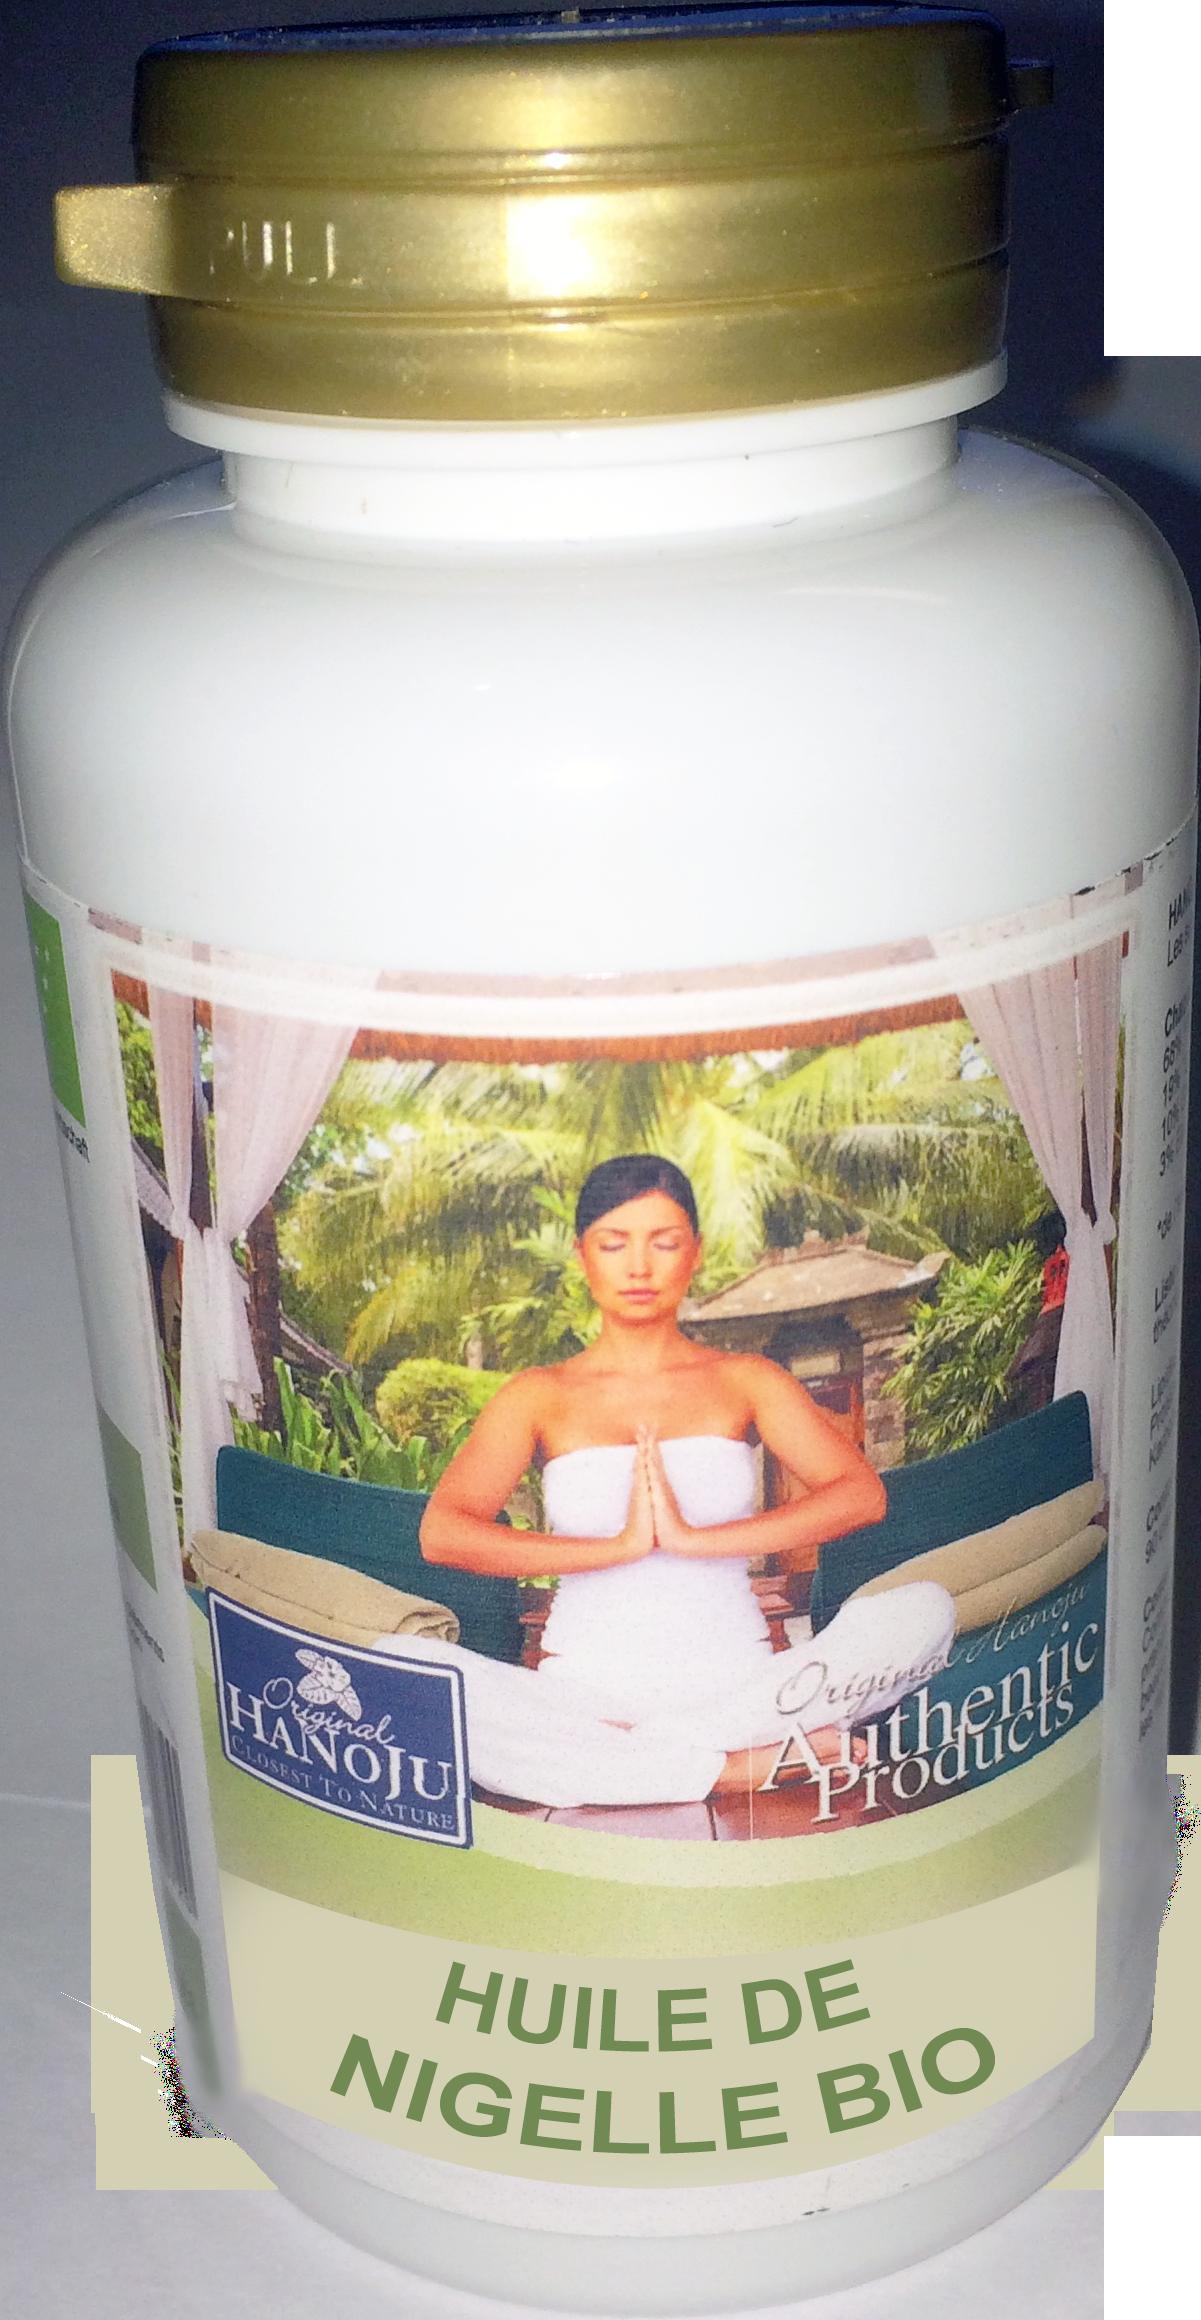 Huile de Nigelle bio - 90 gélules - 500 mg